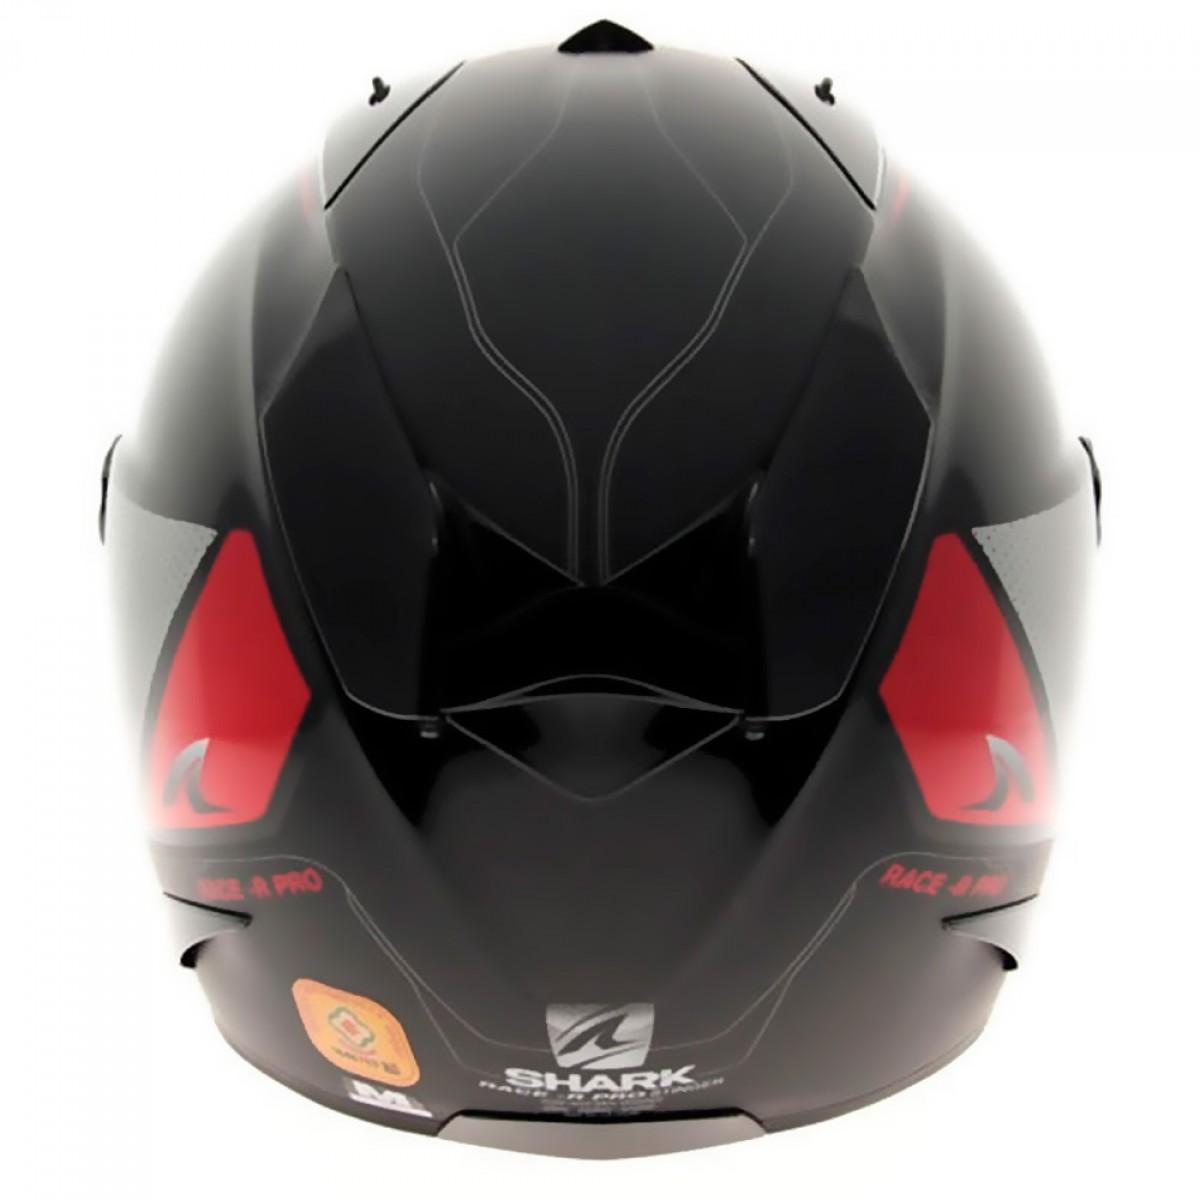 Capacete Shark Race-R PRO Stinger WKO  - Super Bike - Loja Oficial Alpinestars